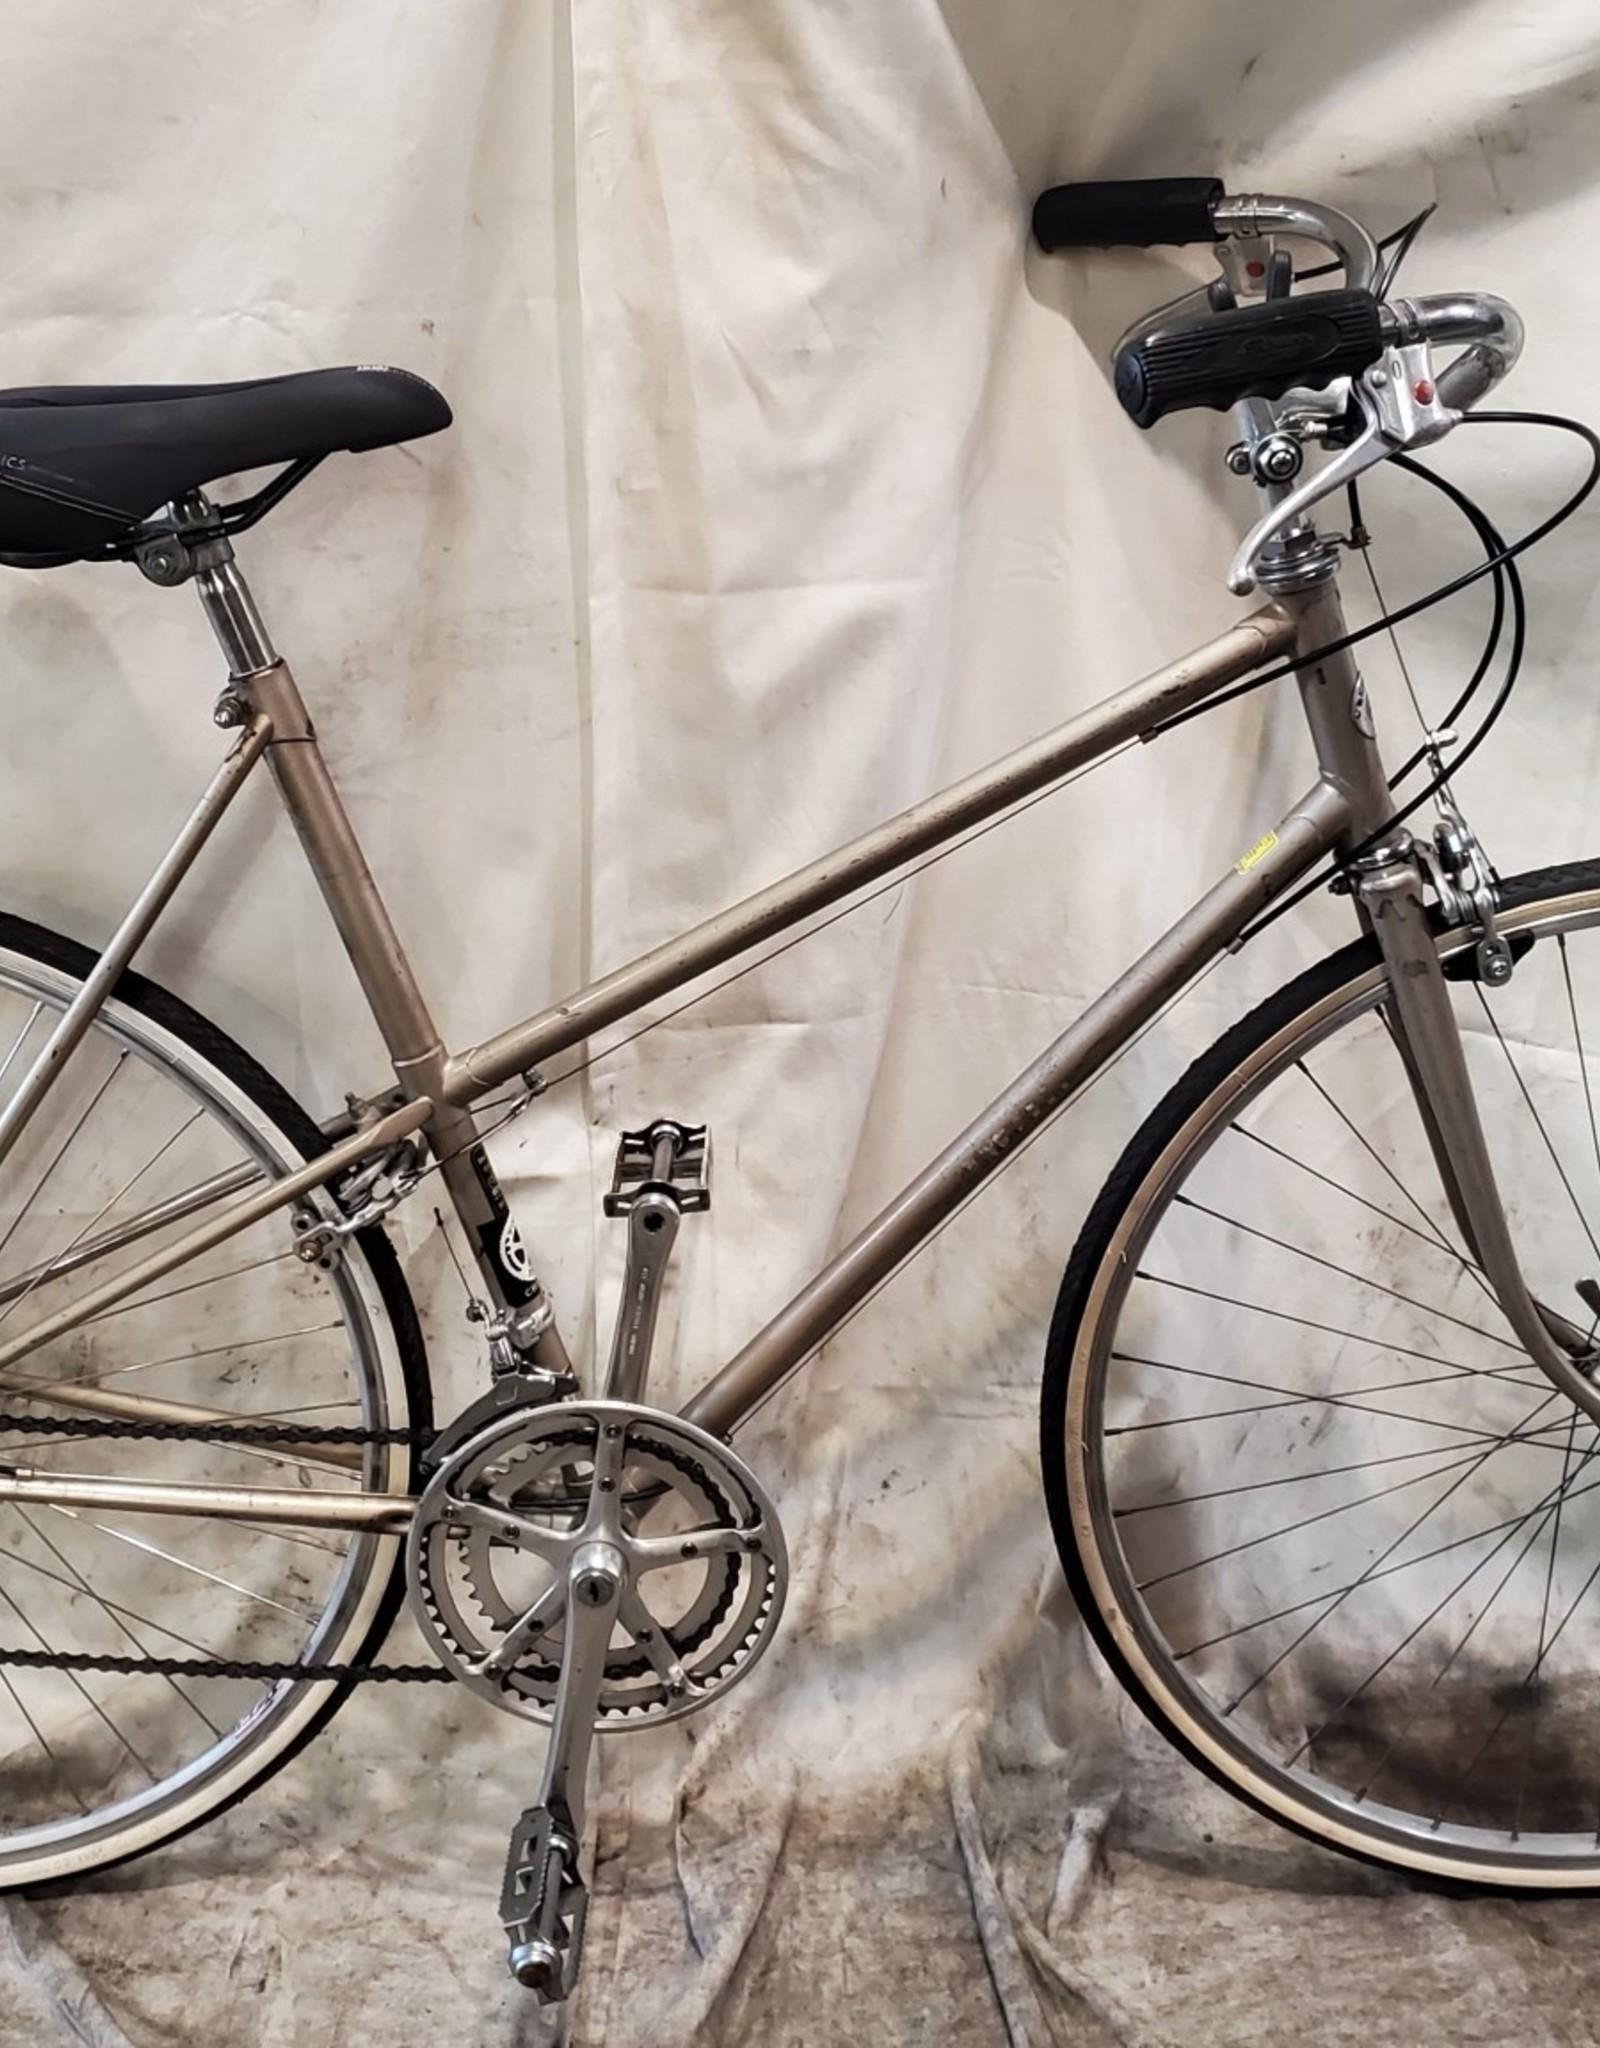 56cm Schwinn Road Bike (2779 sfr)